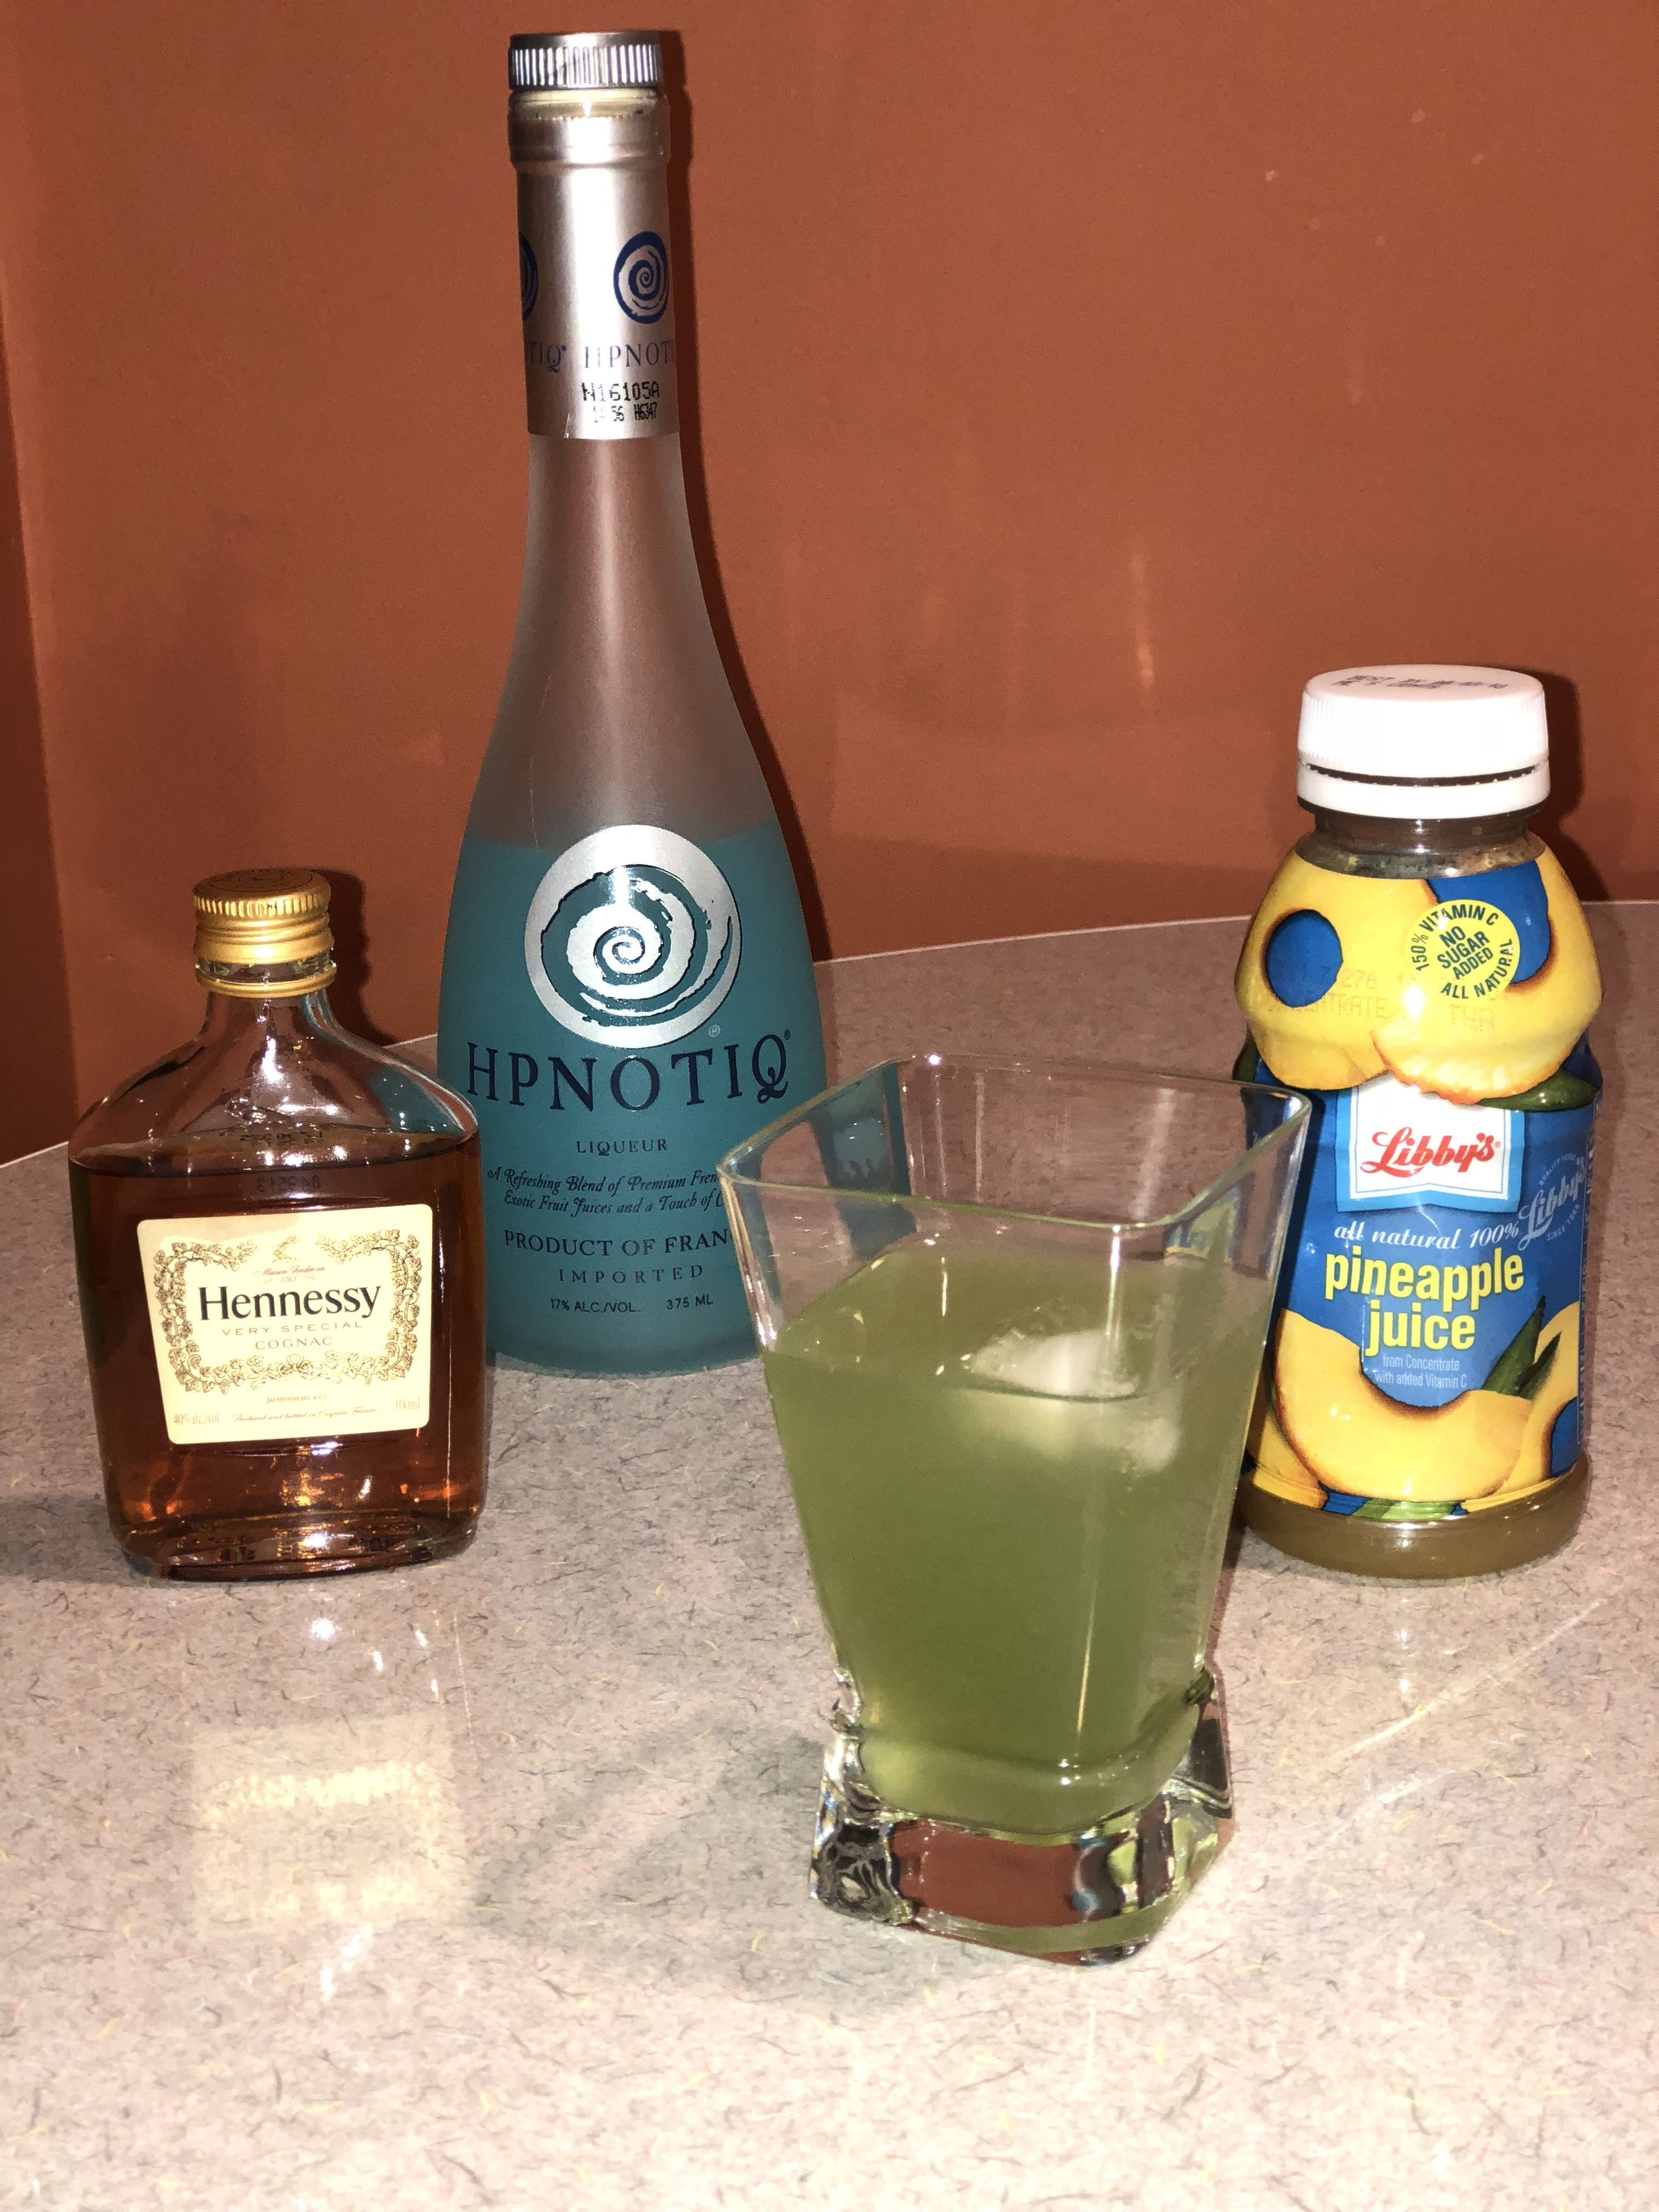 Incredible Hulk Drink 1/2oz Hennessy, 2 1/2oz HPNOTIQ mix ...